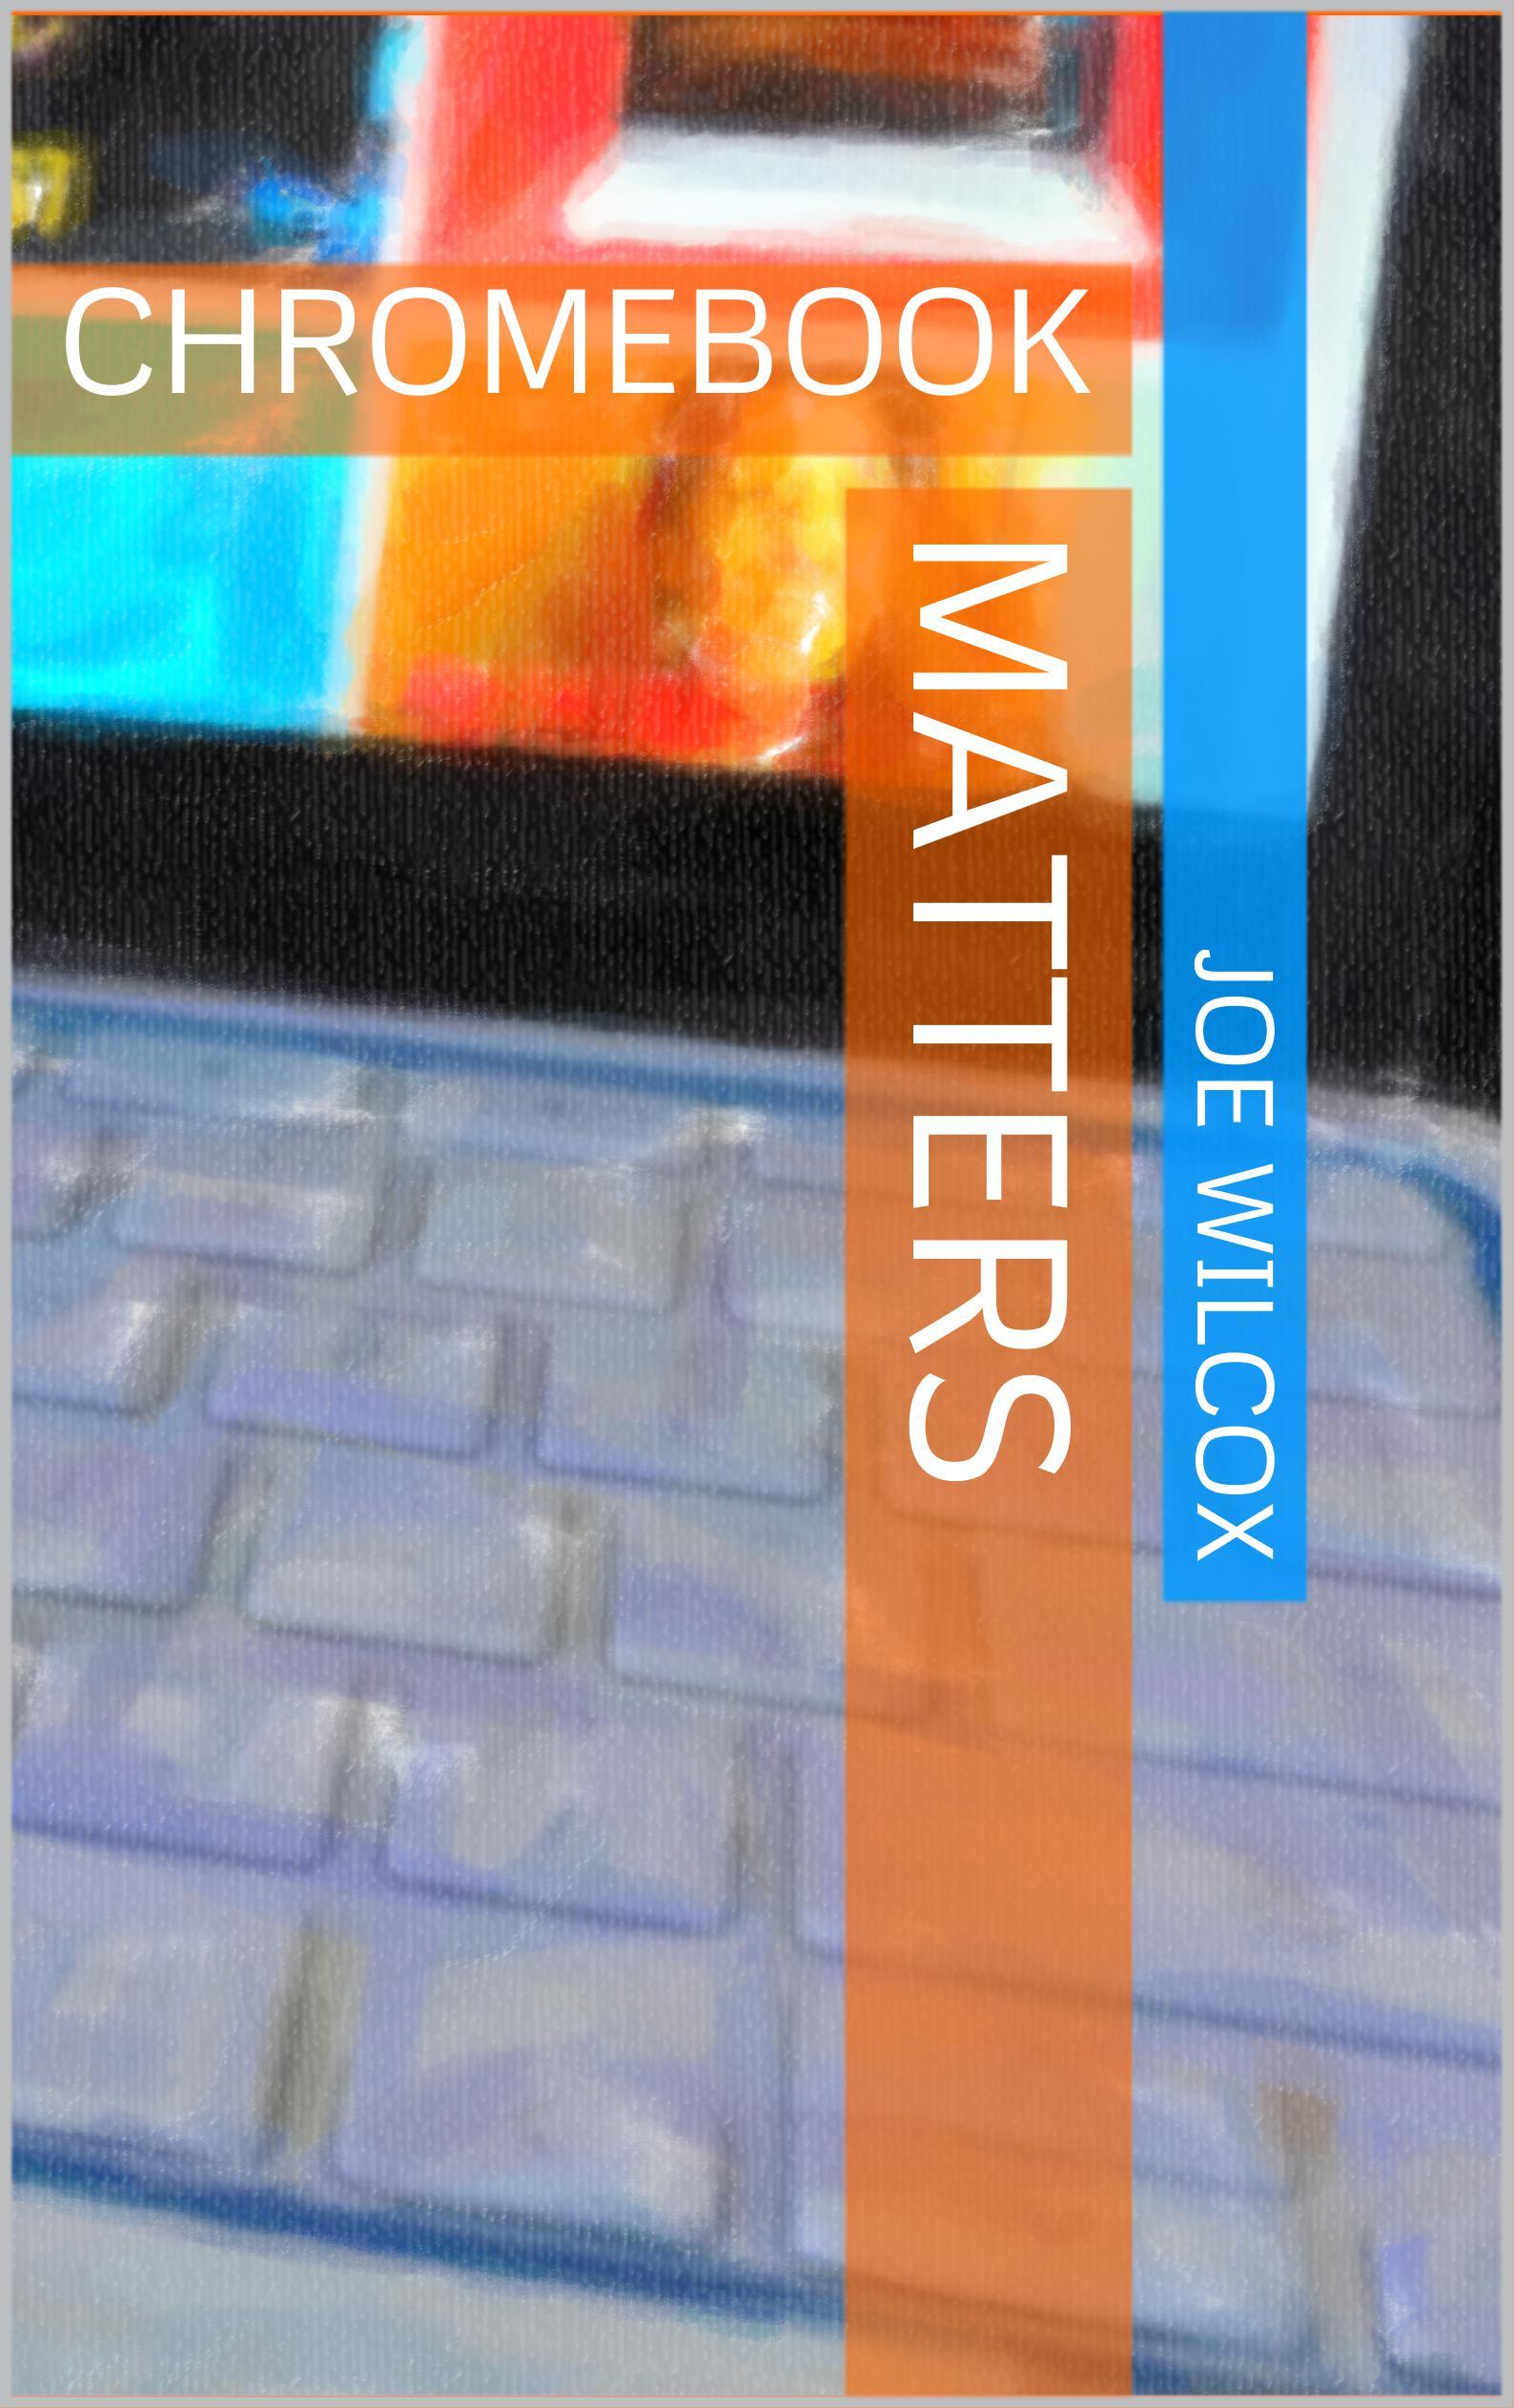 Chromebook-Matters